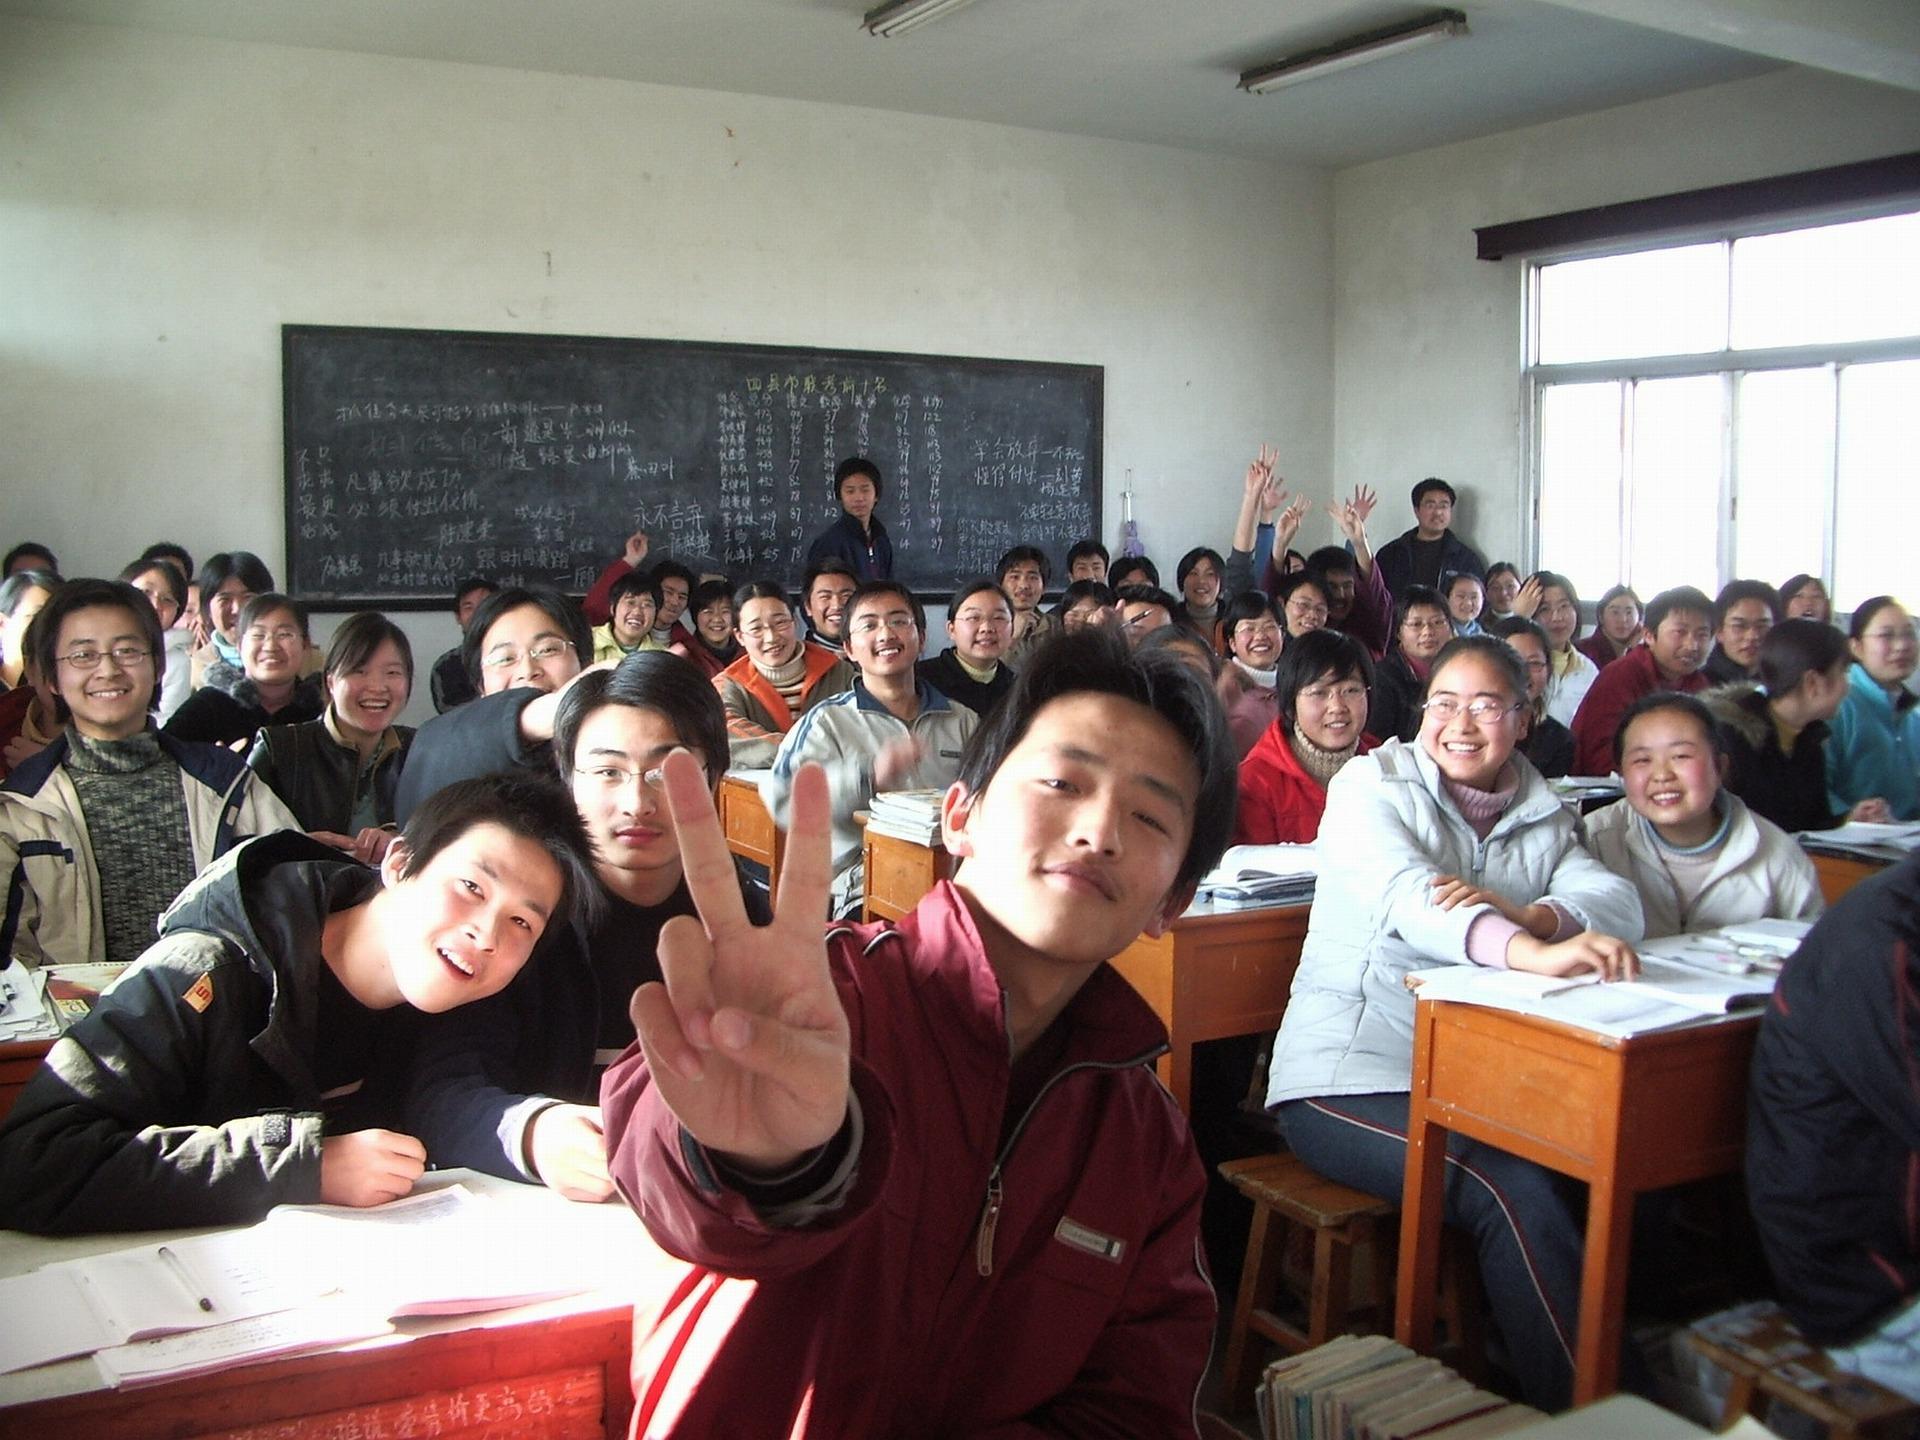 classroom-15593_1920-1507576978.jpg